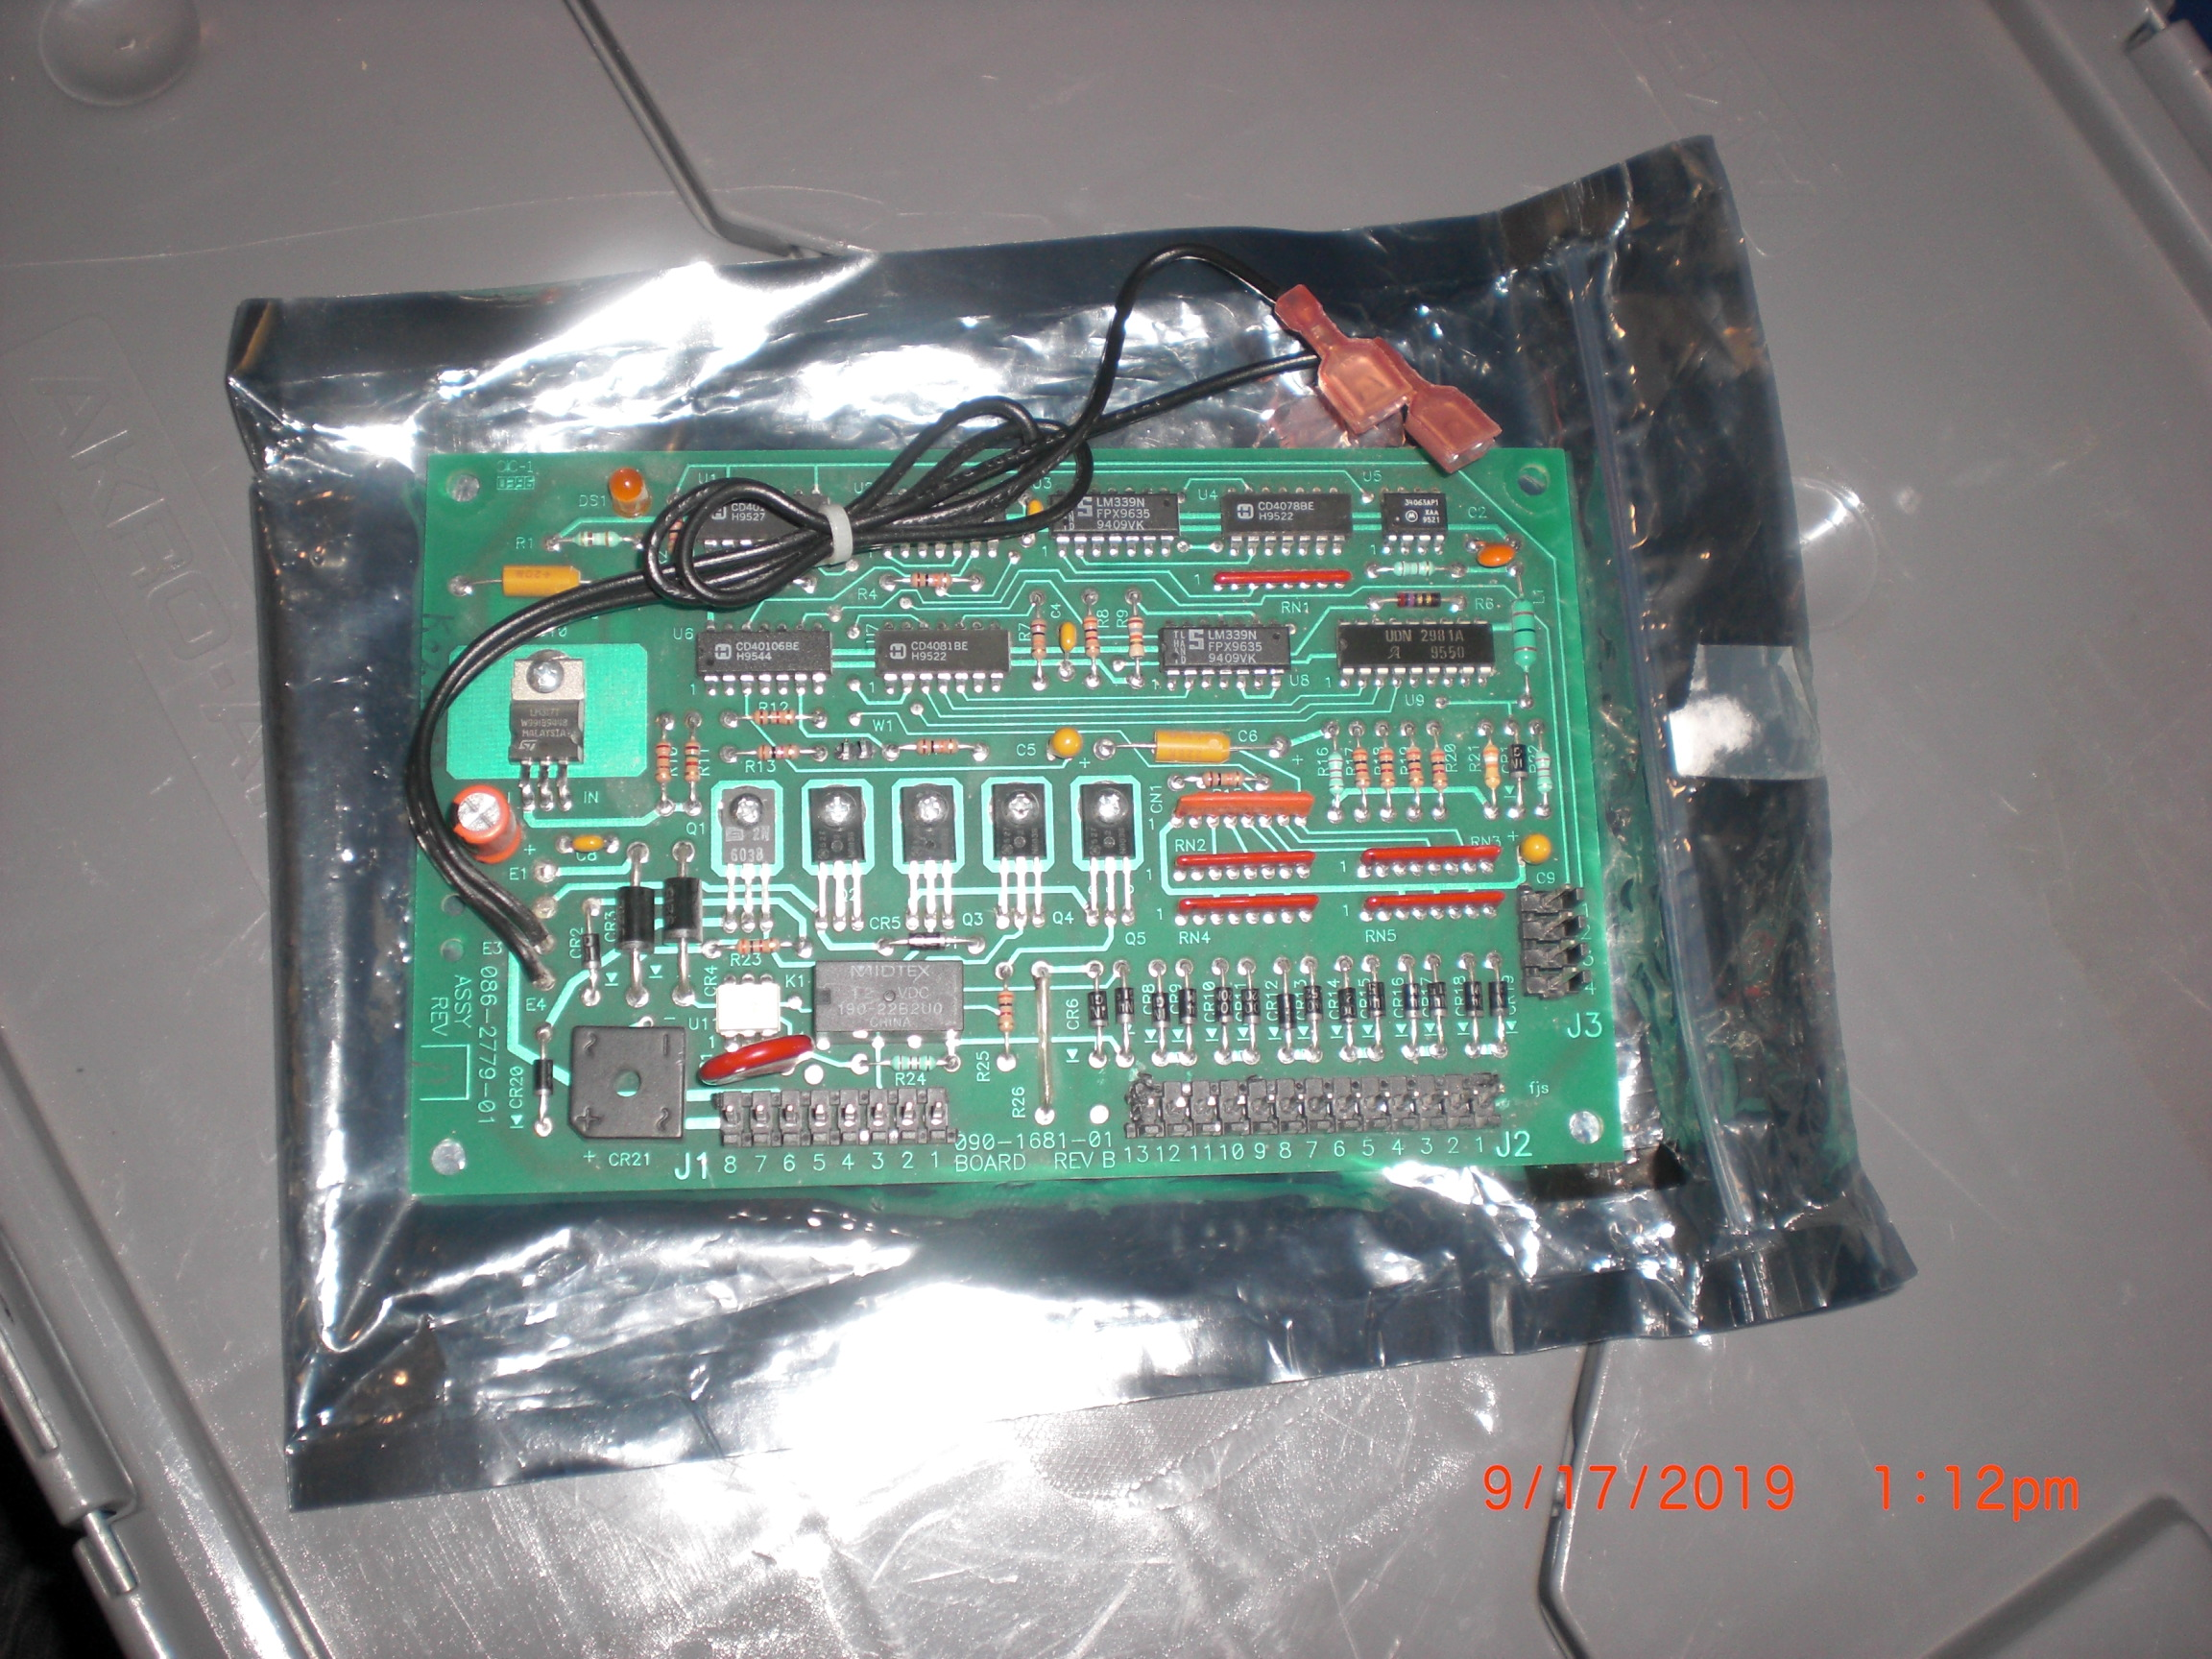 PCB TRANSLOGIC 086-2779-01 Curtain Control